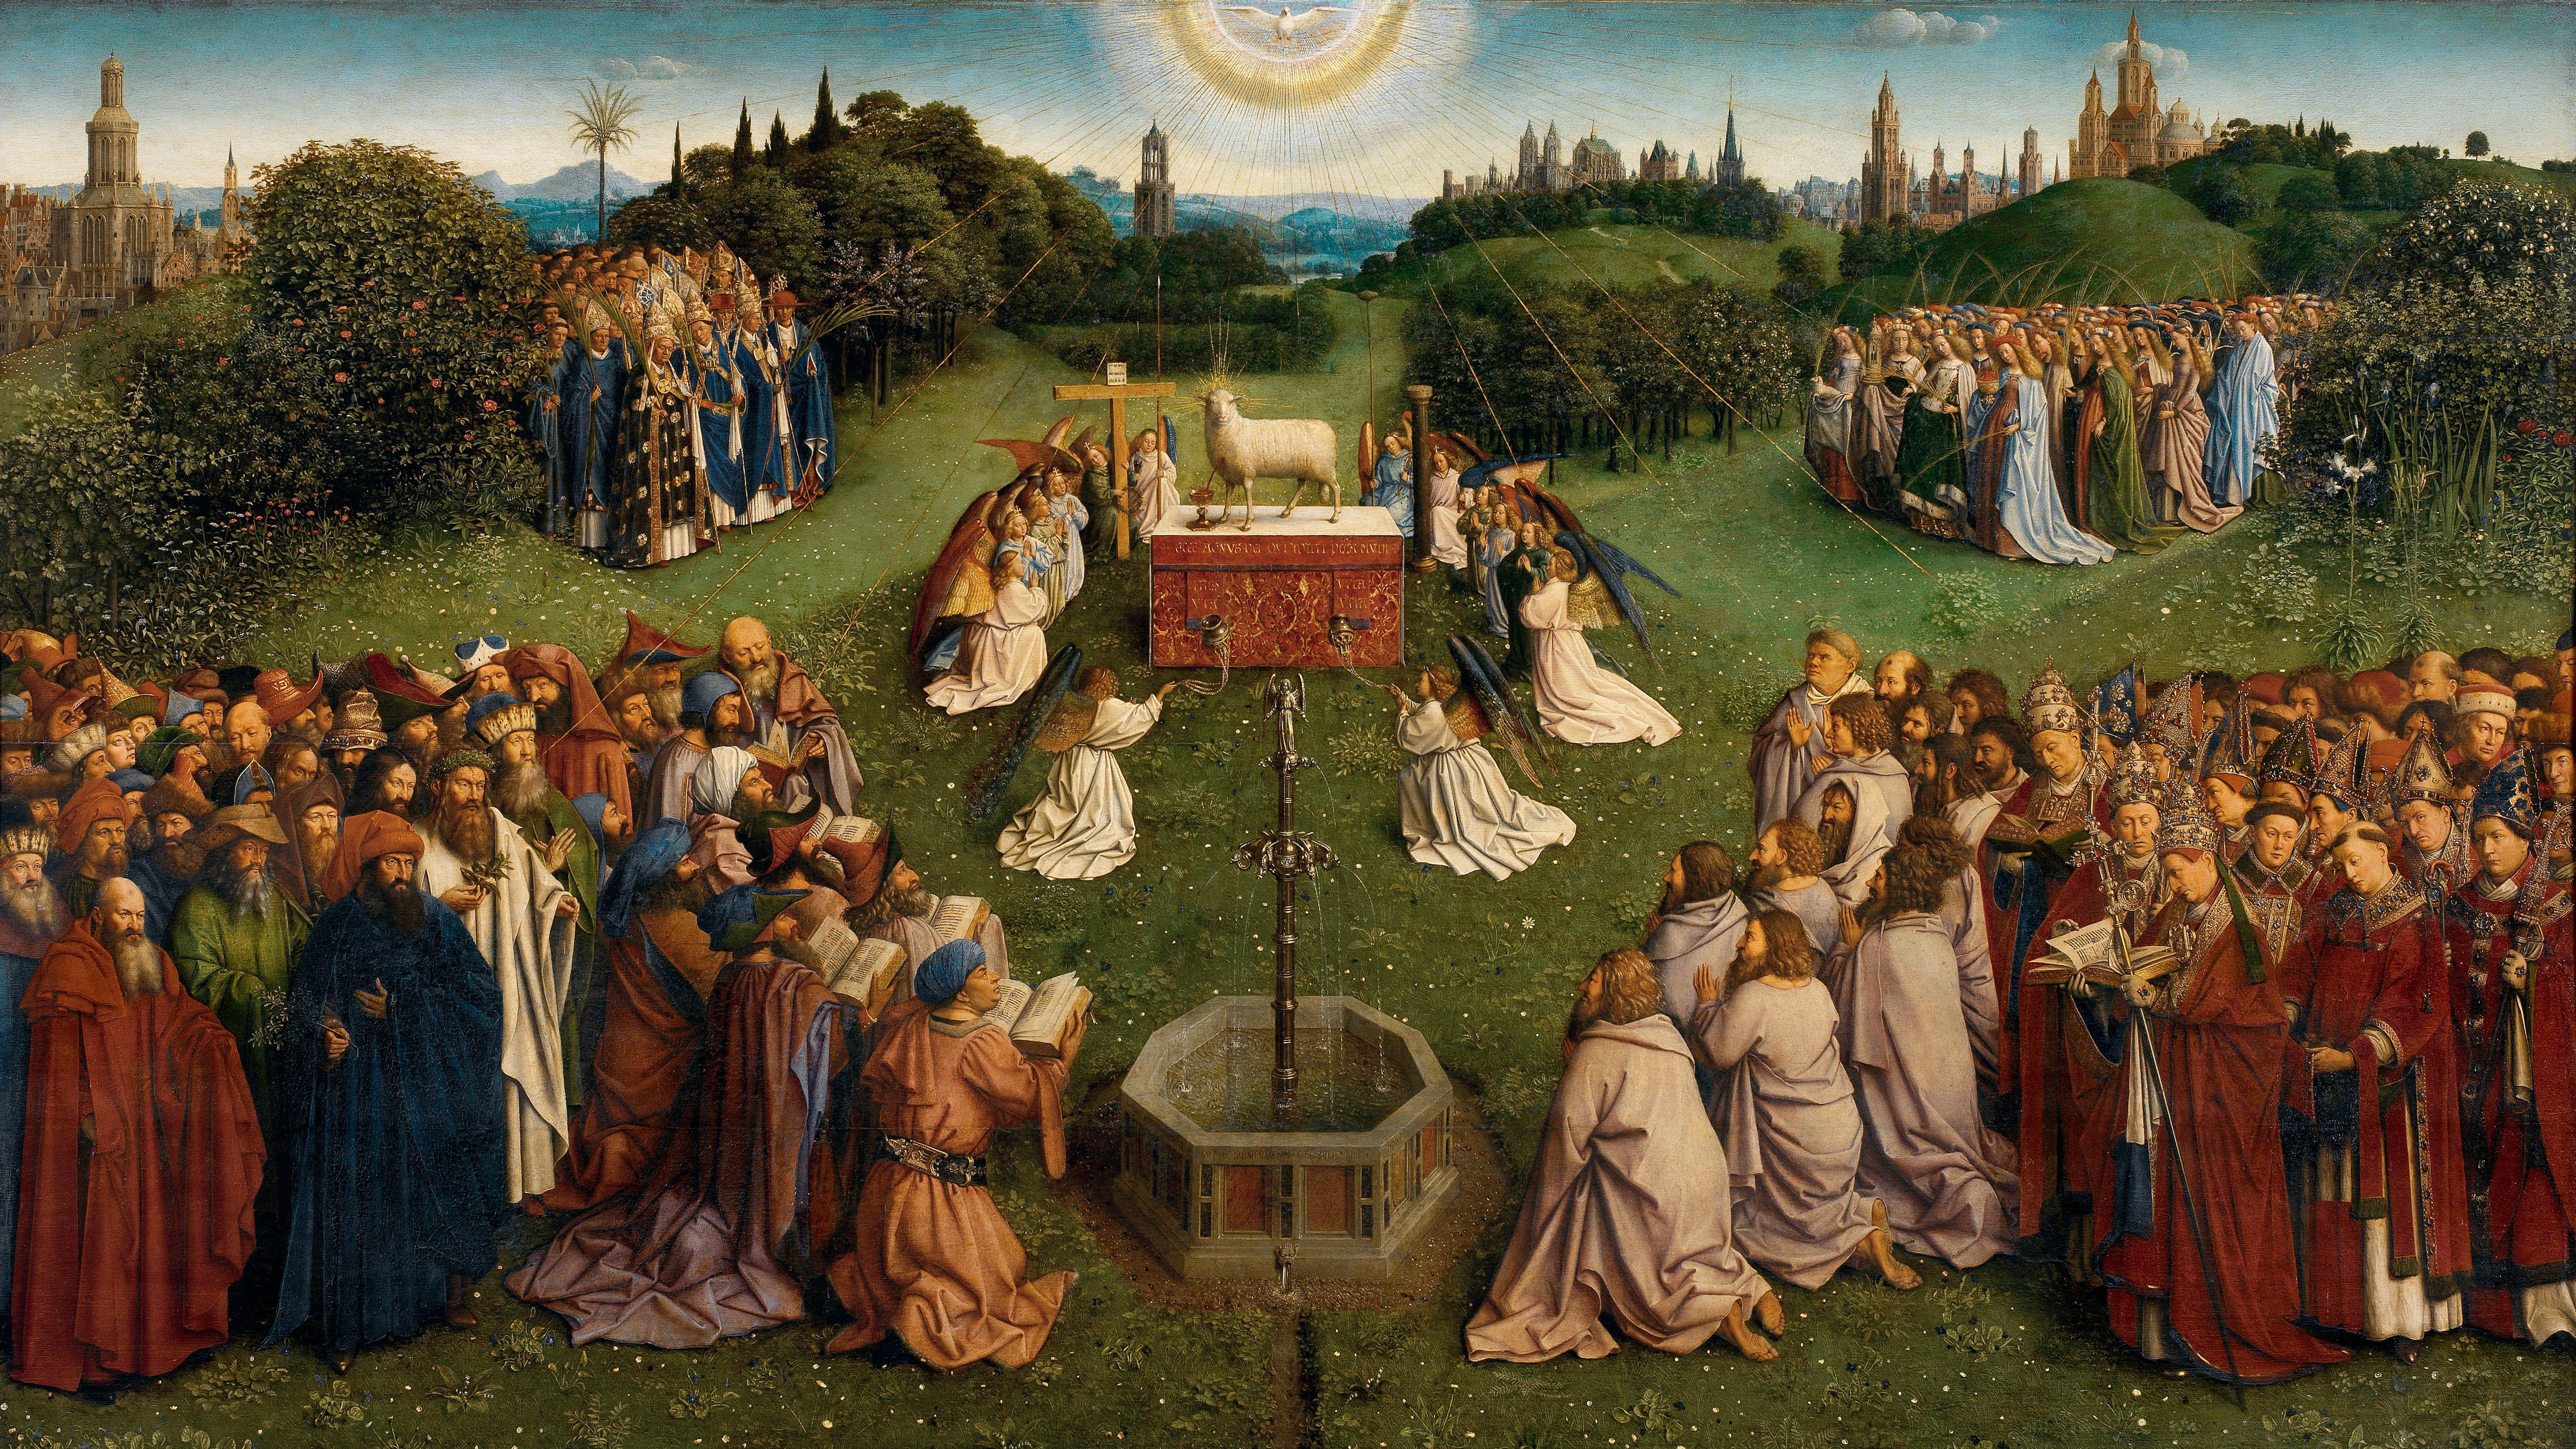 Adoration of the Mystic Lamb (Ghent Altarpiece)